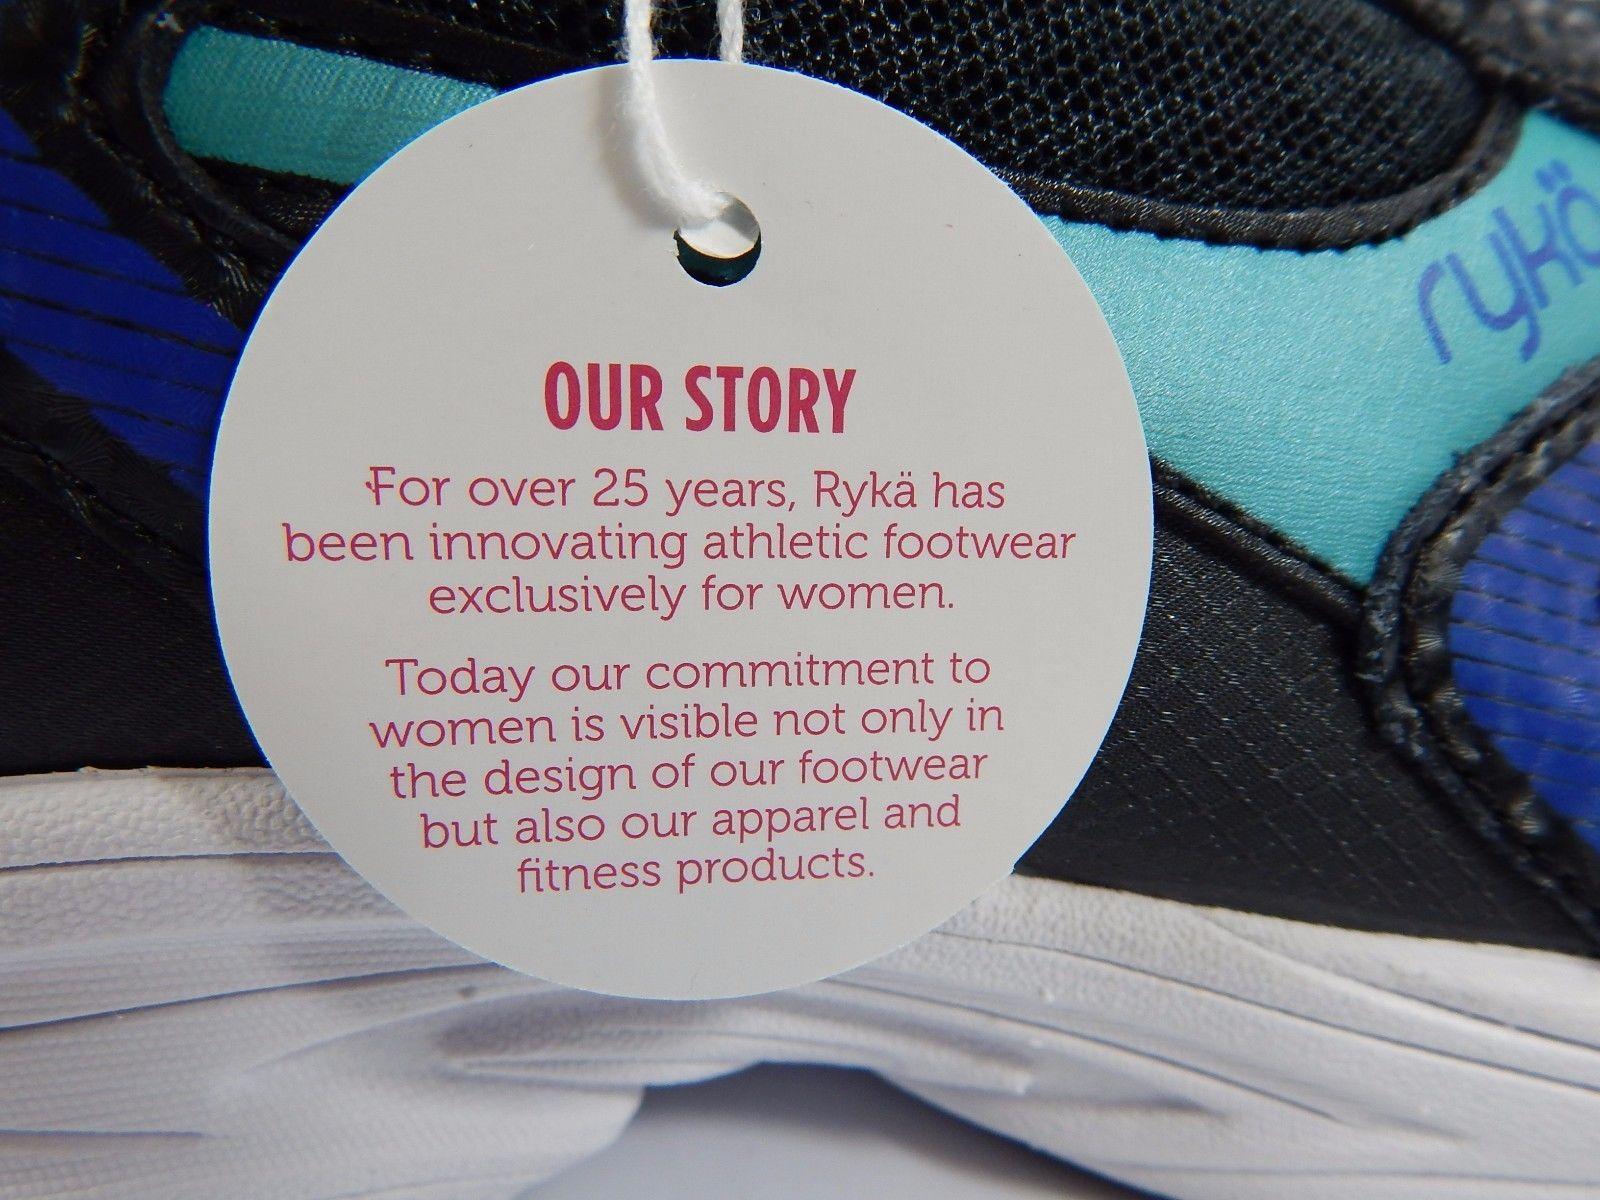 Ryka Streak SMR Women's Running Shoes Size US 8 M (B) EU 39 Black Aqua Blue